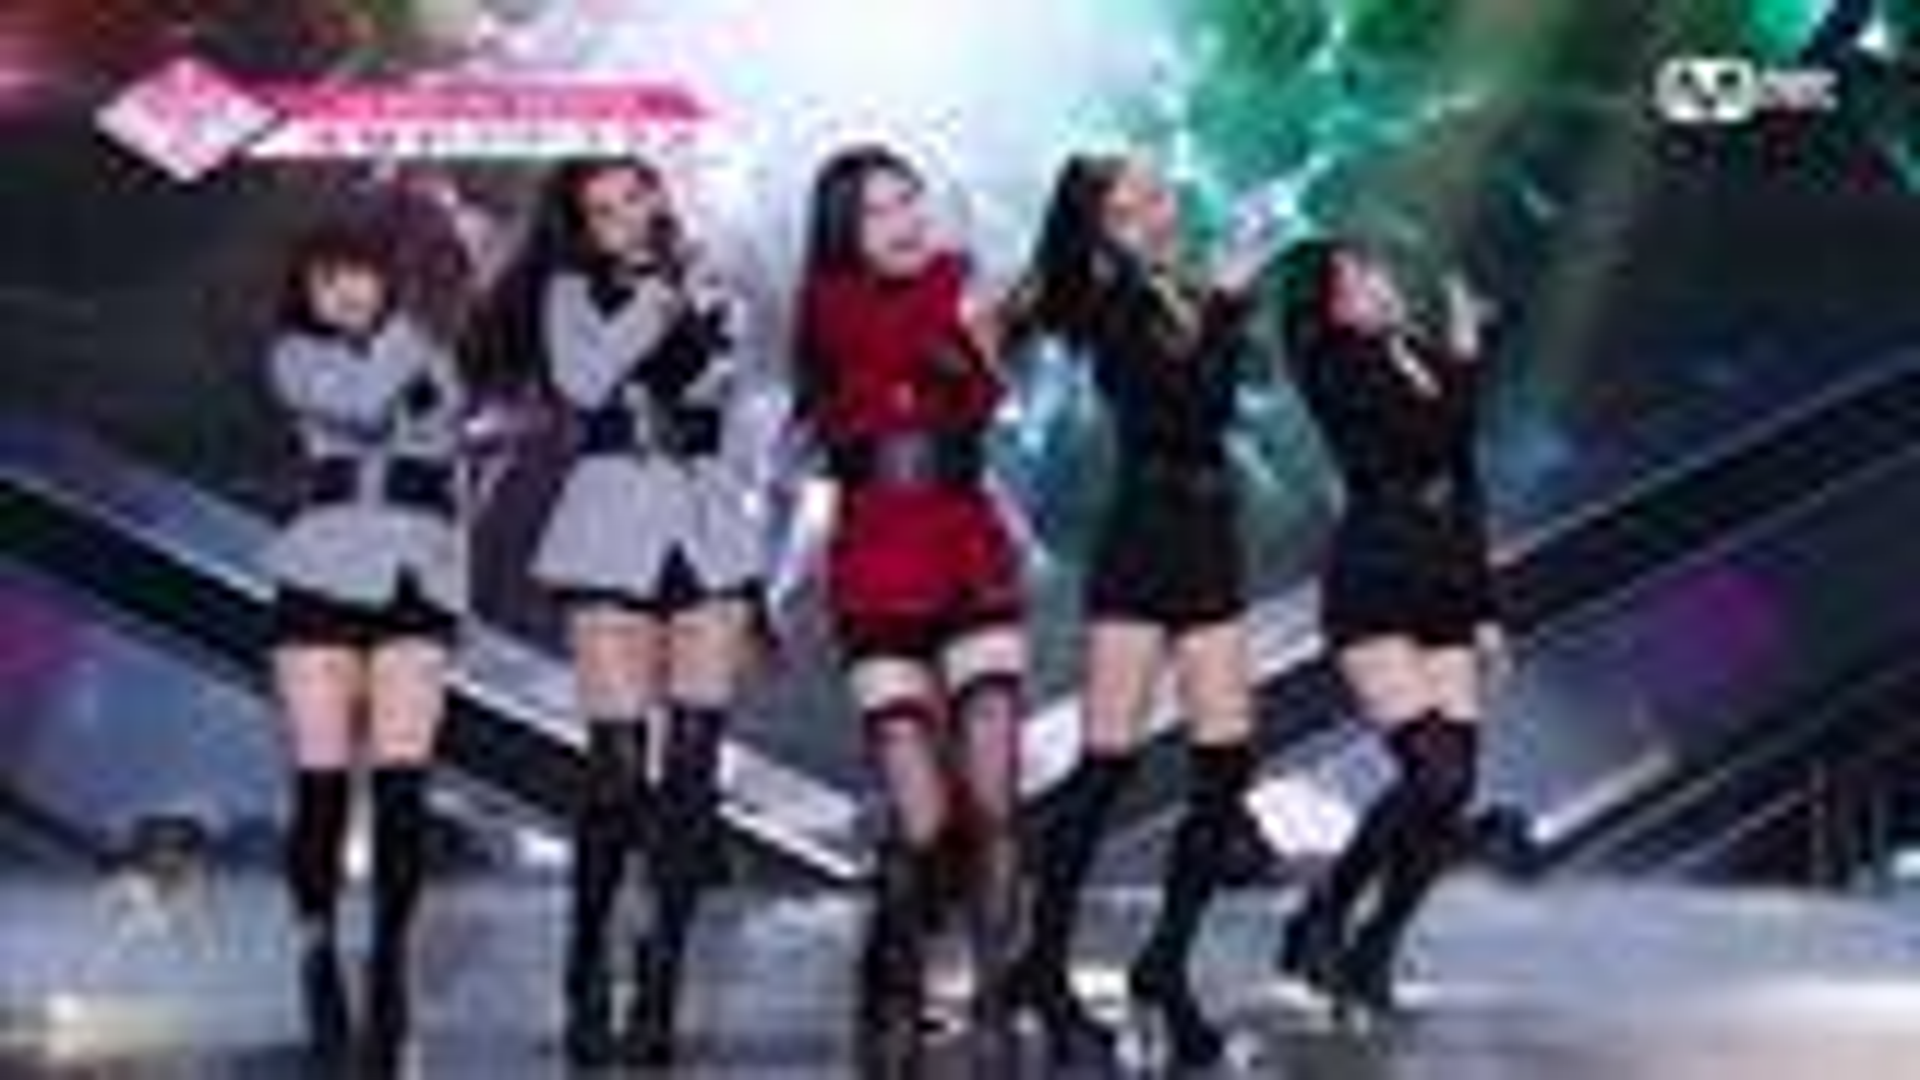 [ENG sub] PRODUCE48 [4회] ′실전에 강하다!′ 흐흥이 난 여우ㅣ레드벨벳